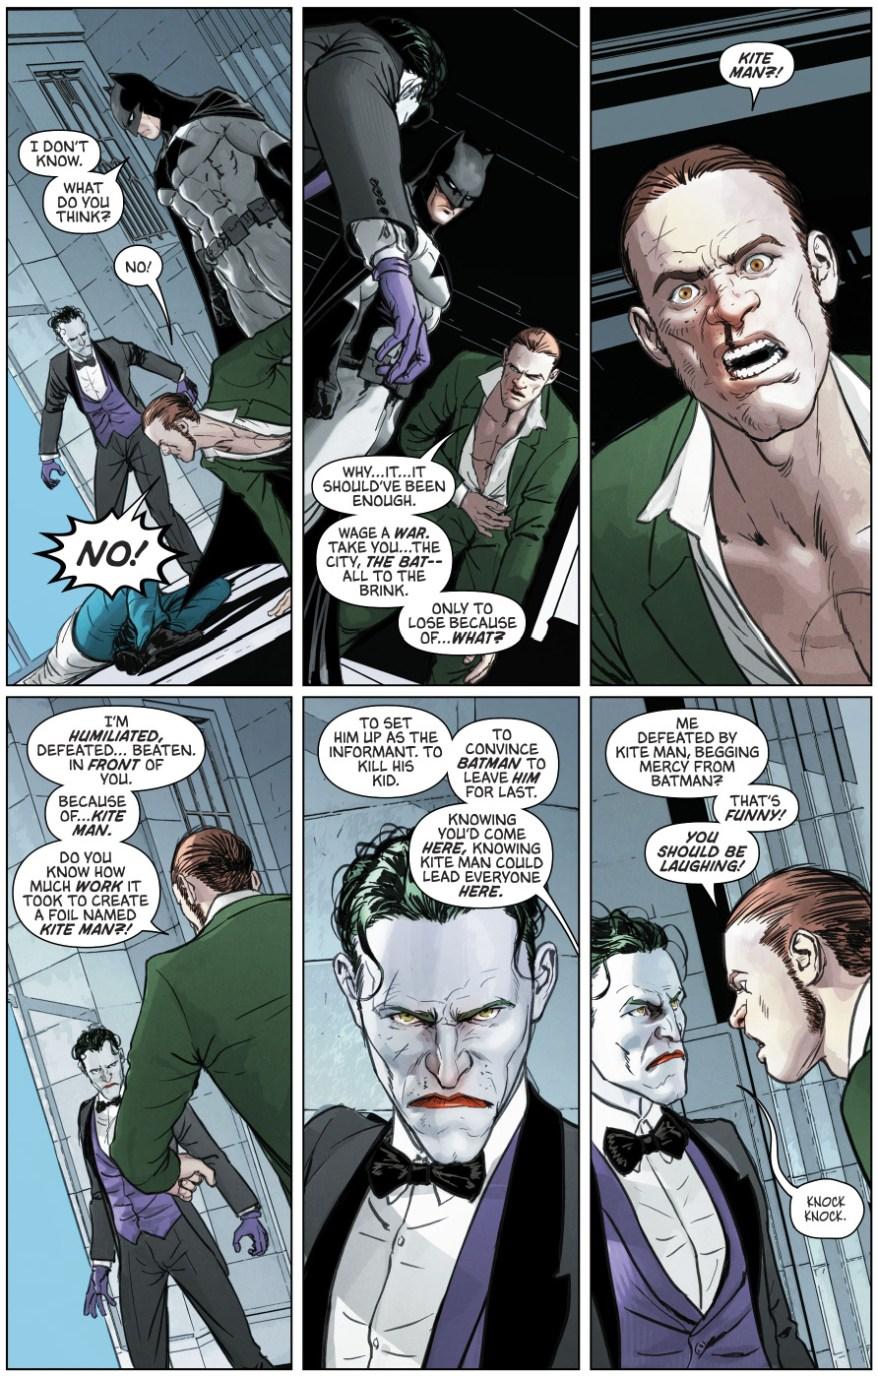 Batman Breaks His No Killing Rule